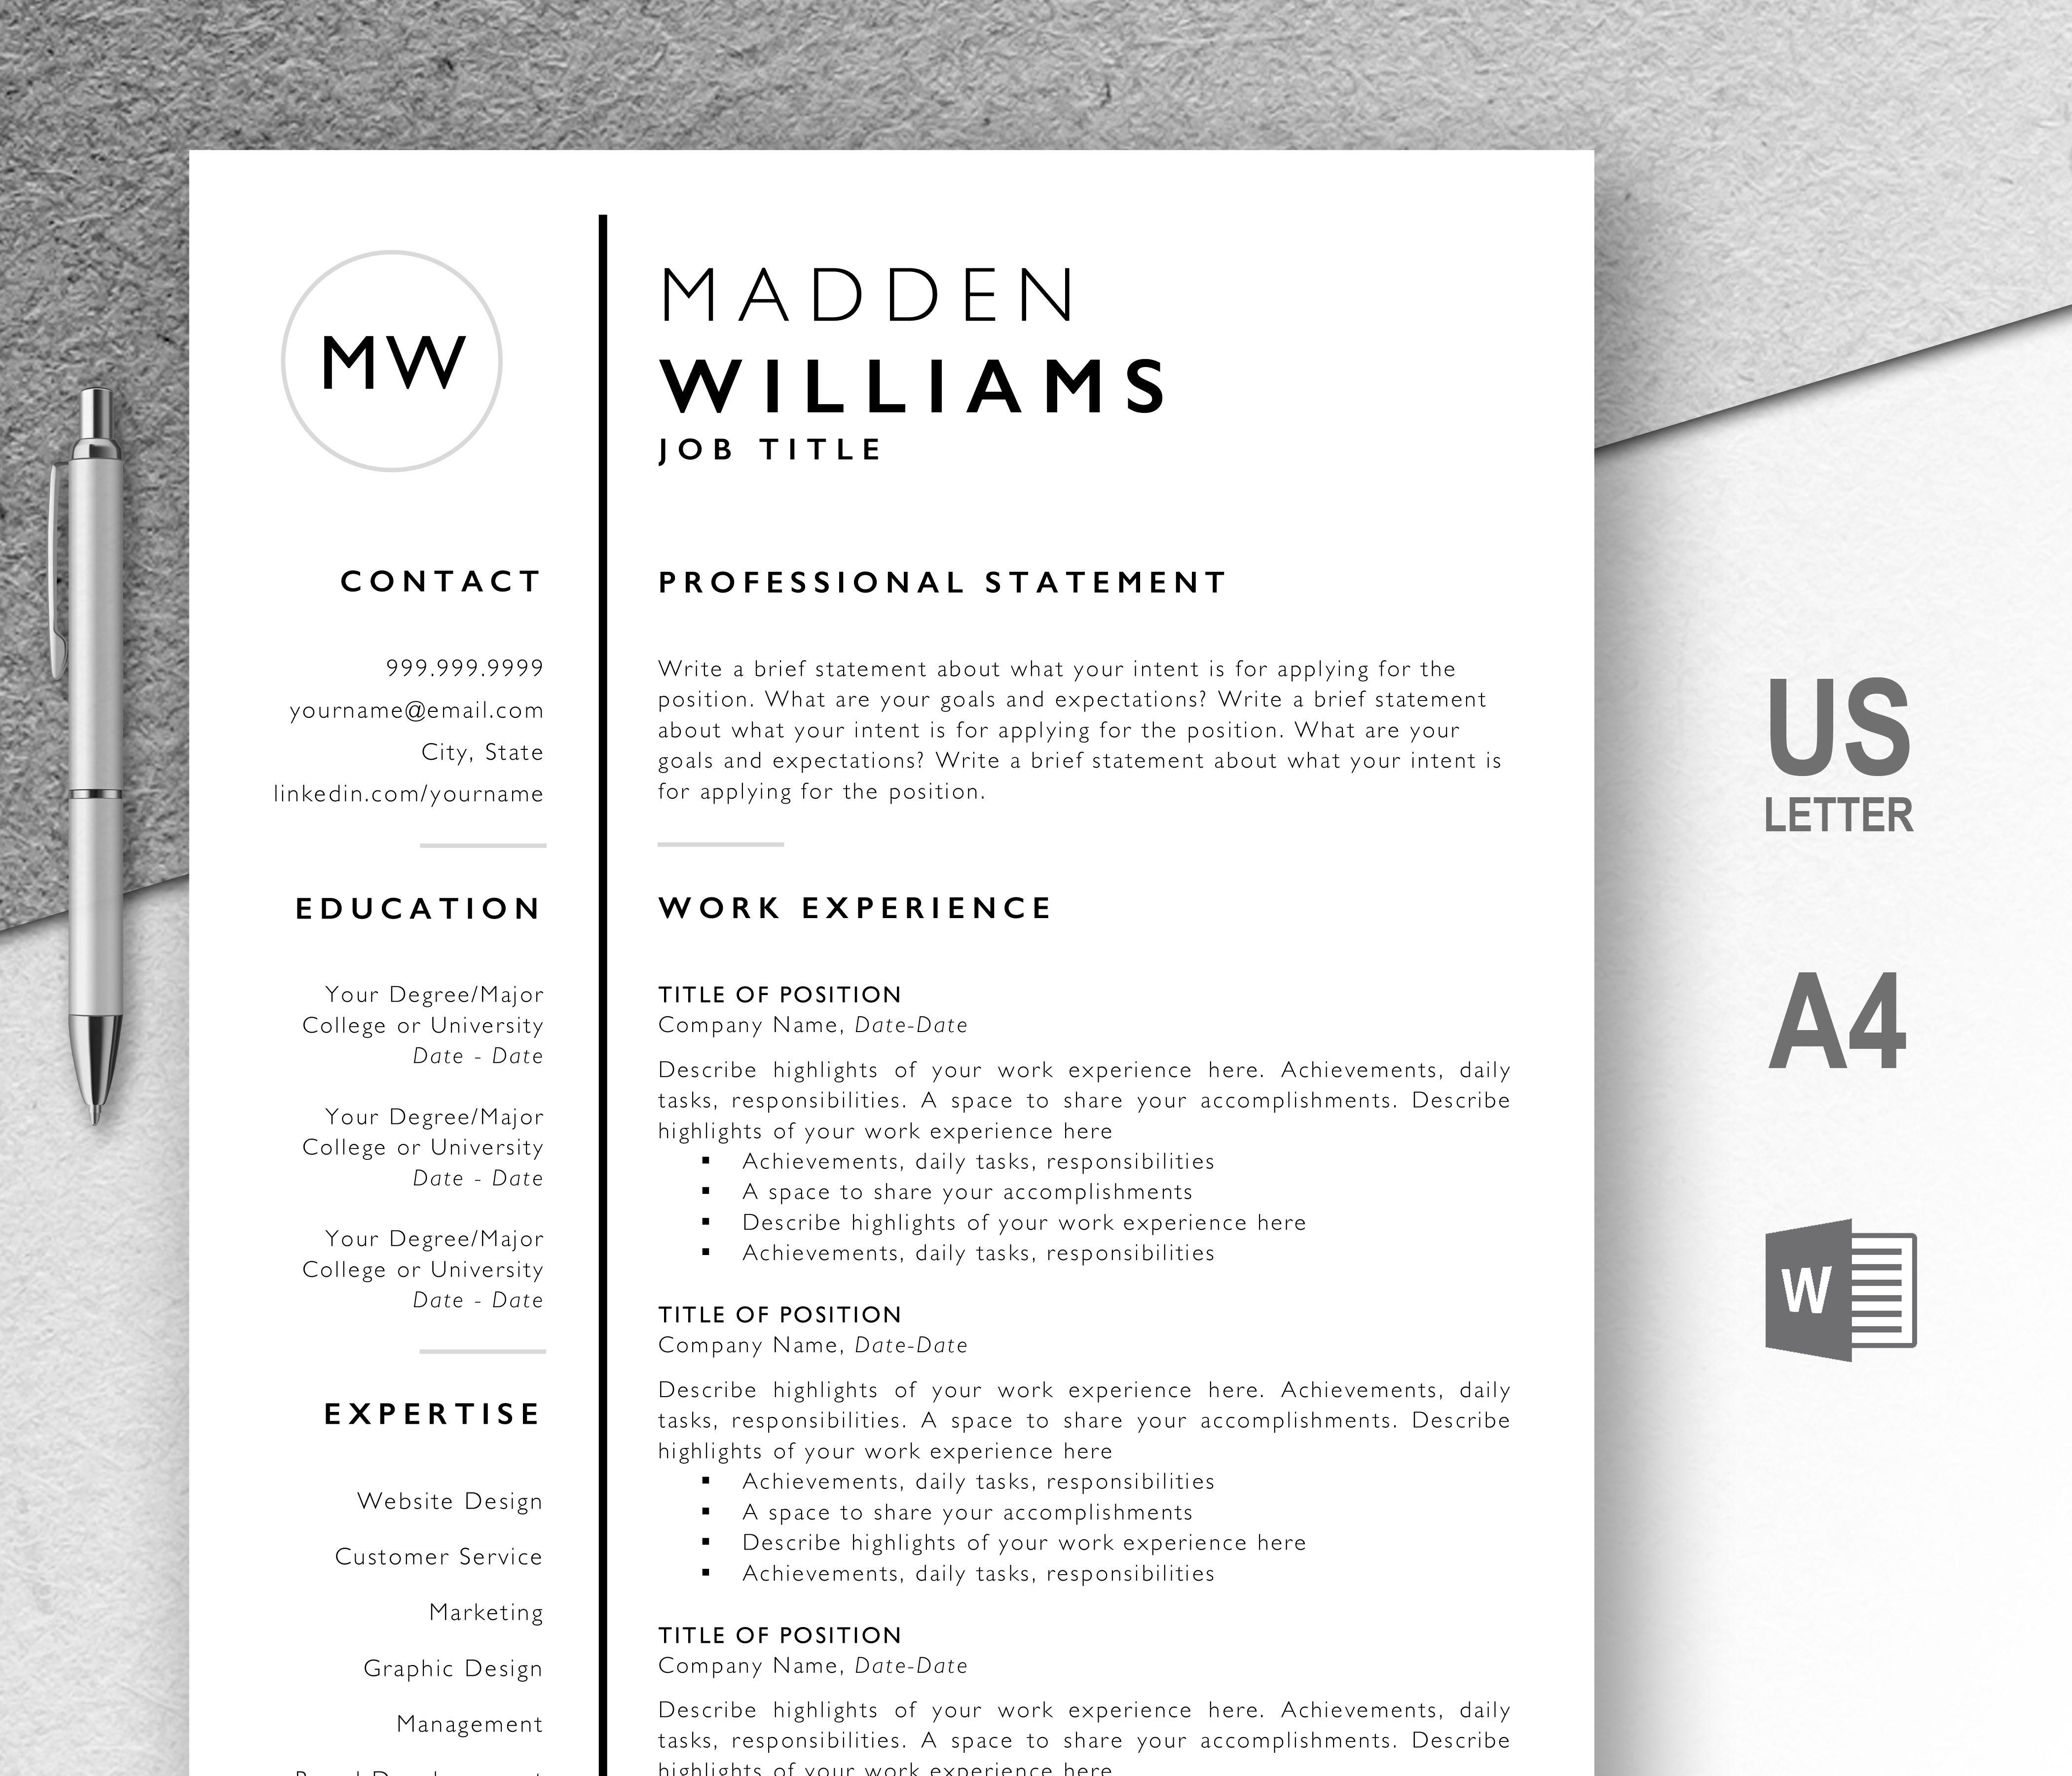 Professional Resume Templates Editable in Microsoft Word